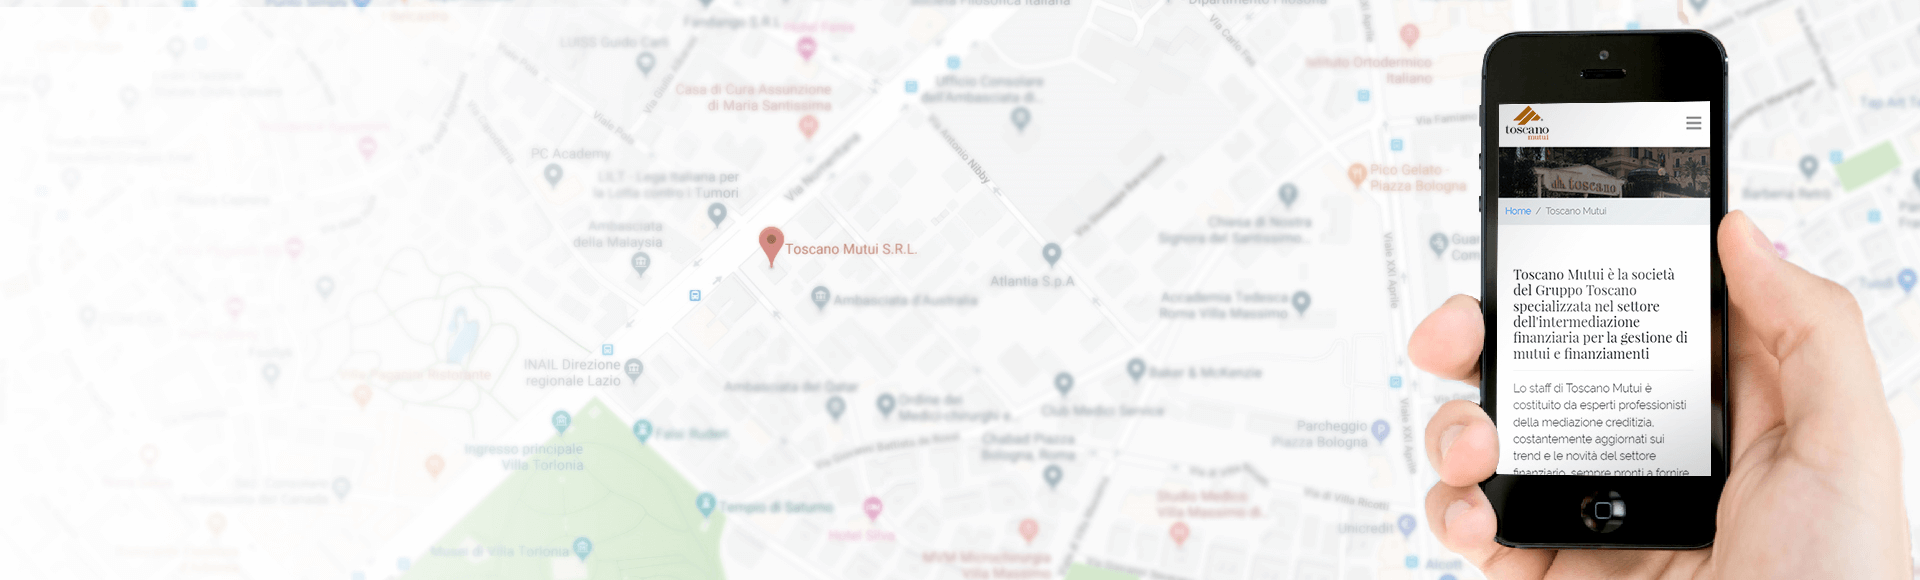 Toscano Mutui